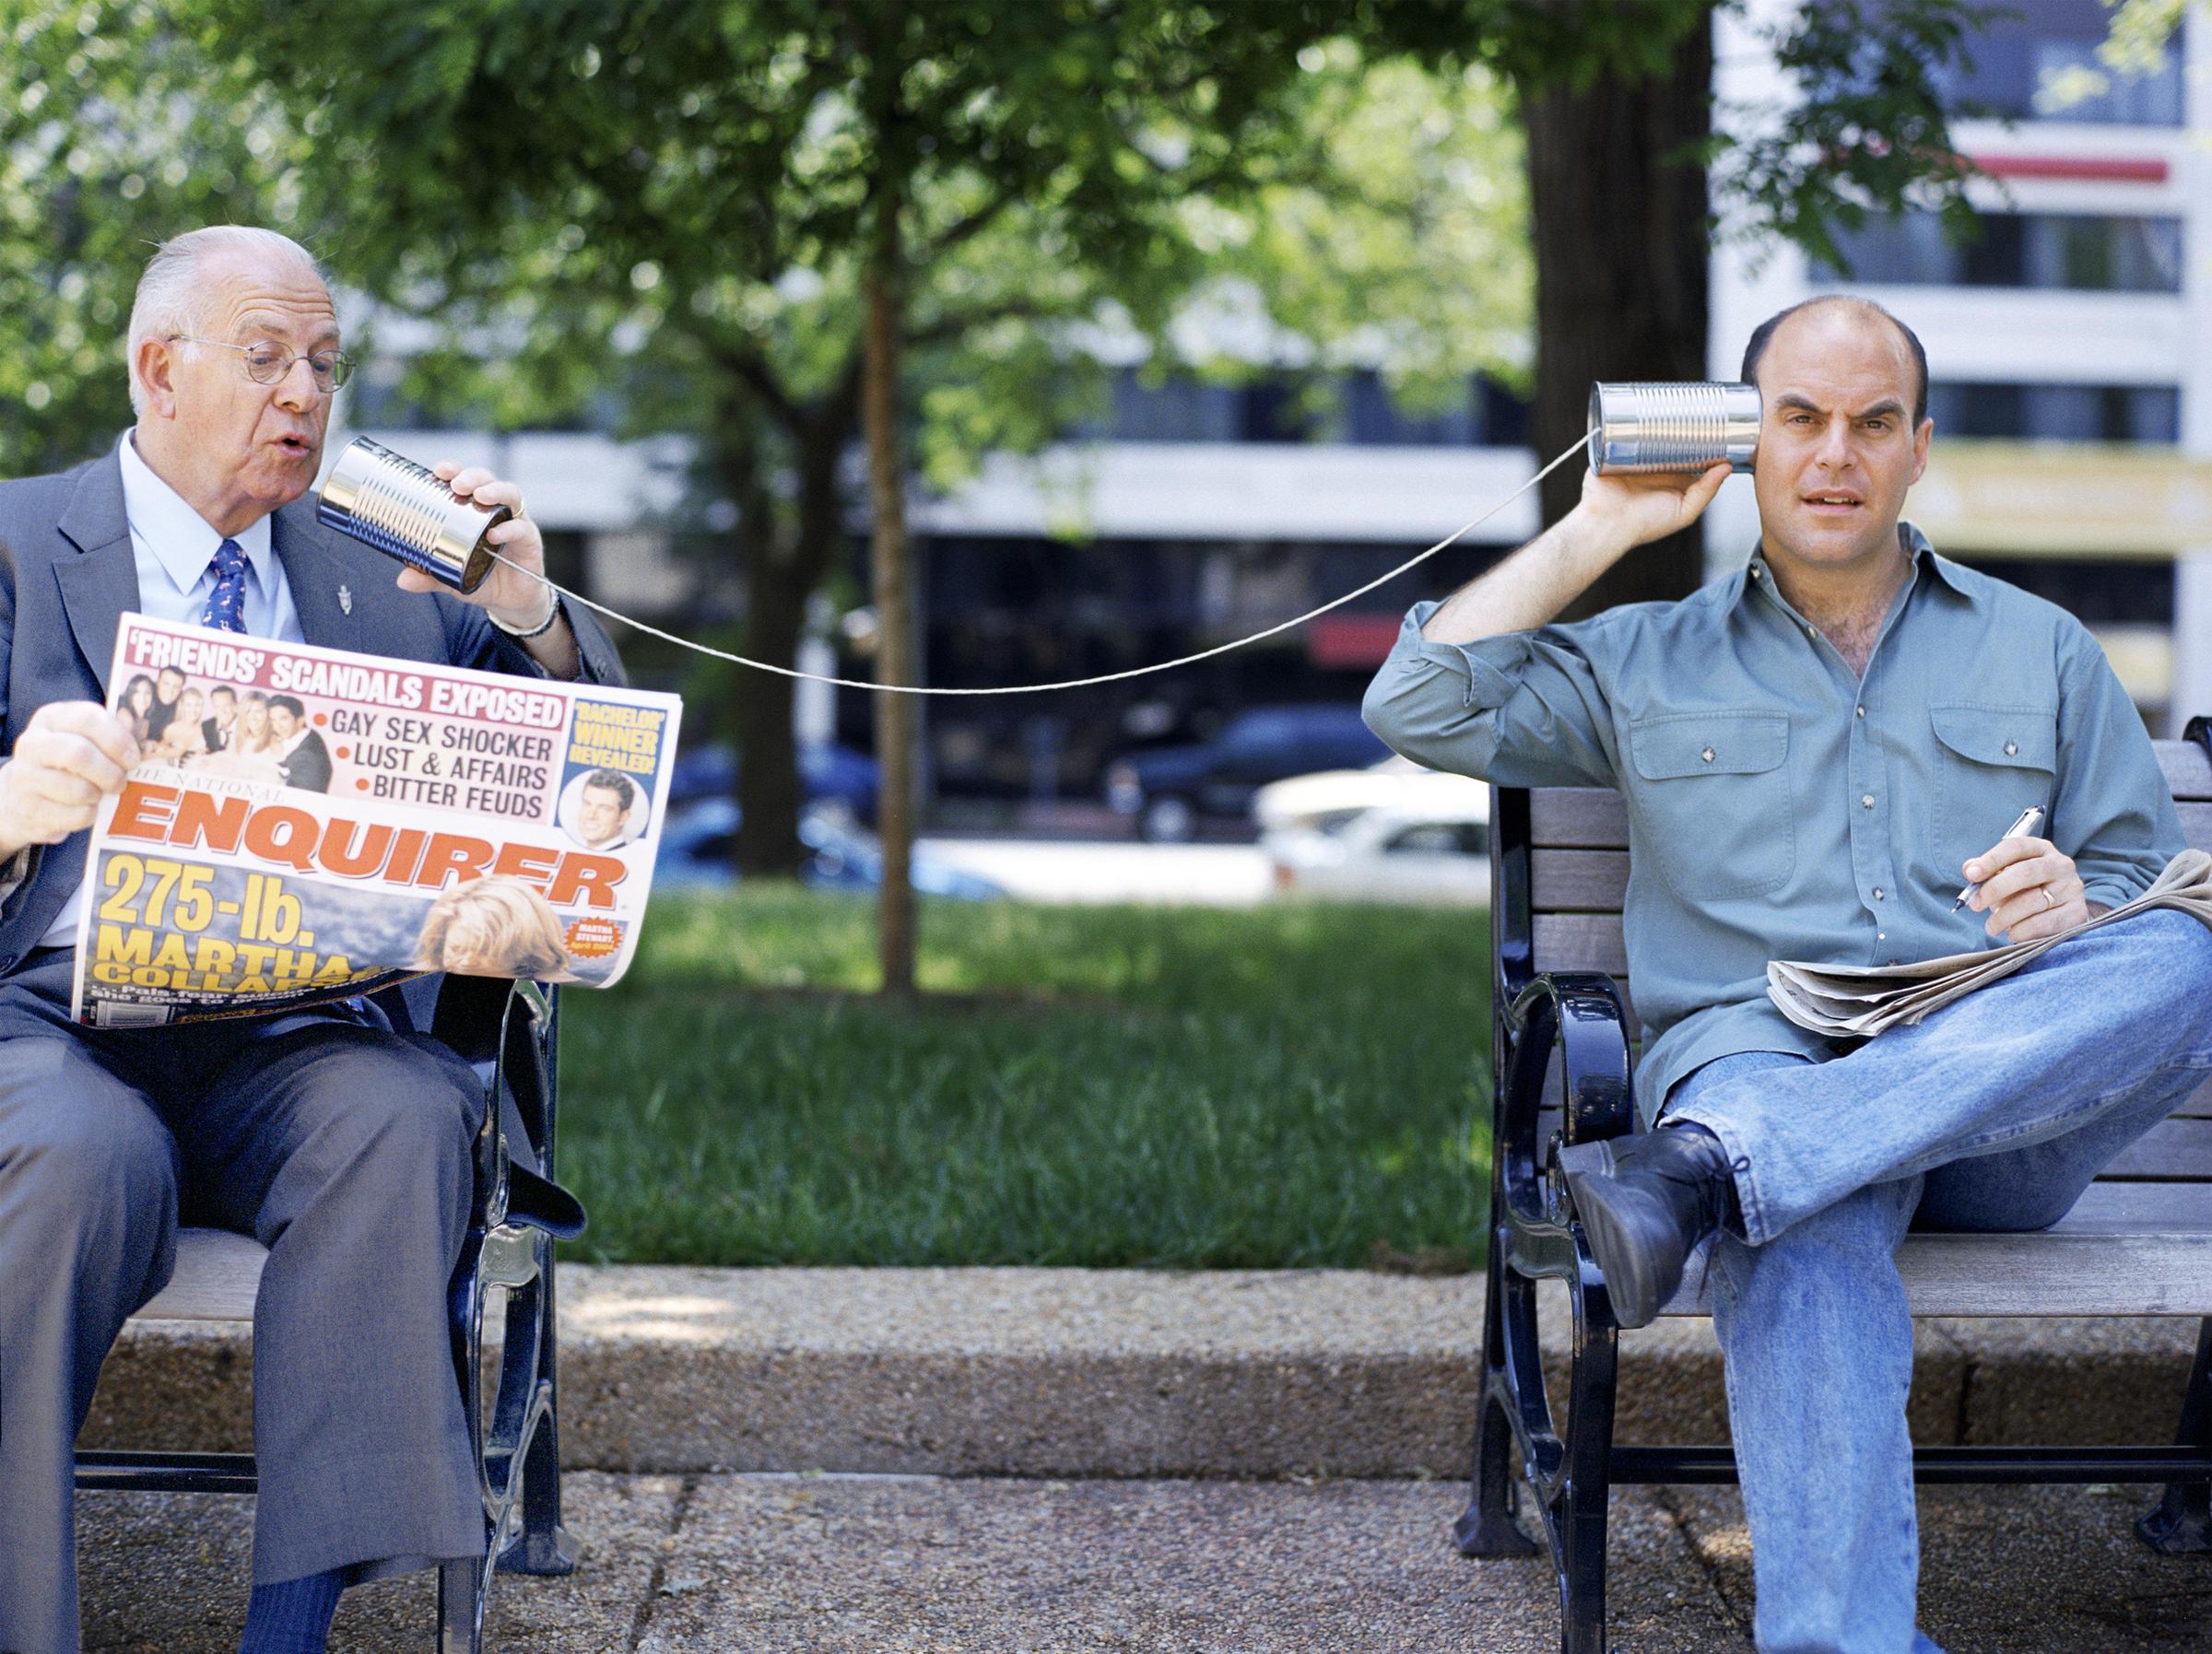 Legendary NPR newscaster Carl Kasell dies at 84